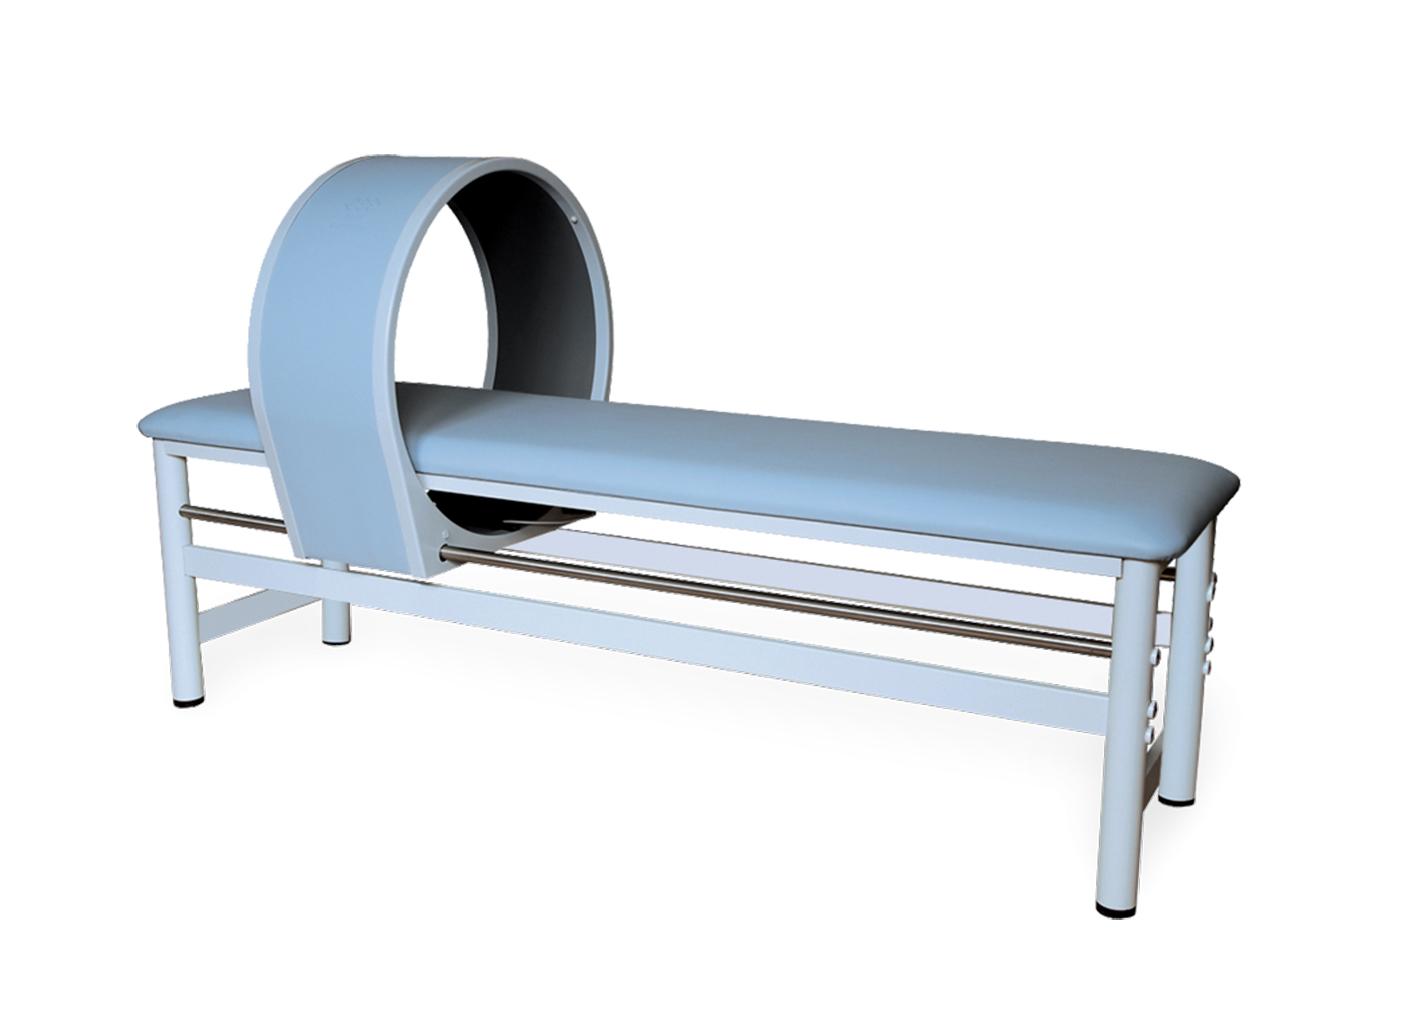 Máy từ trường - BTL-5920 Magnet